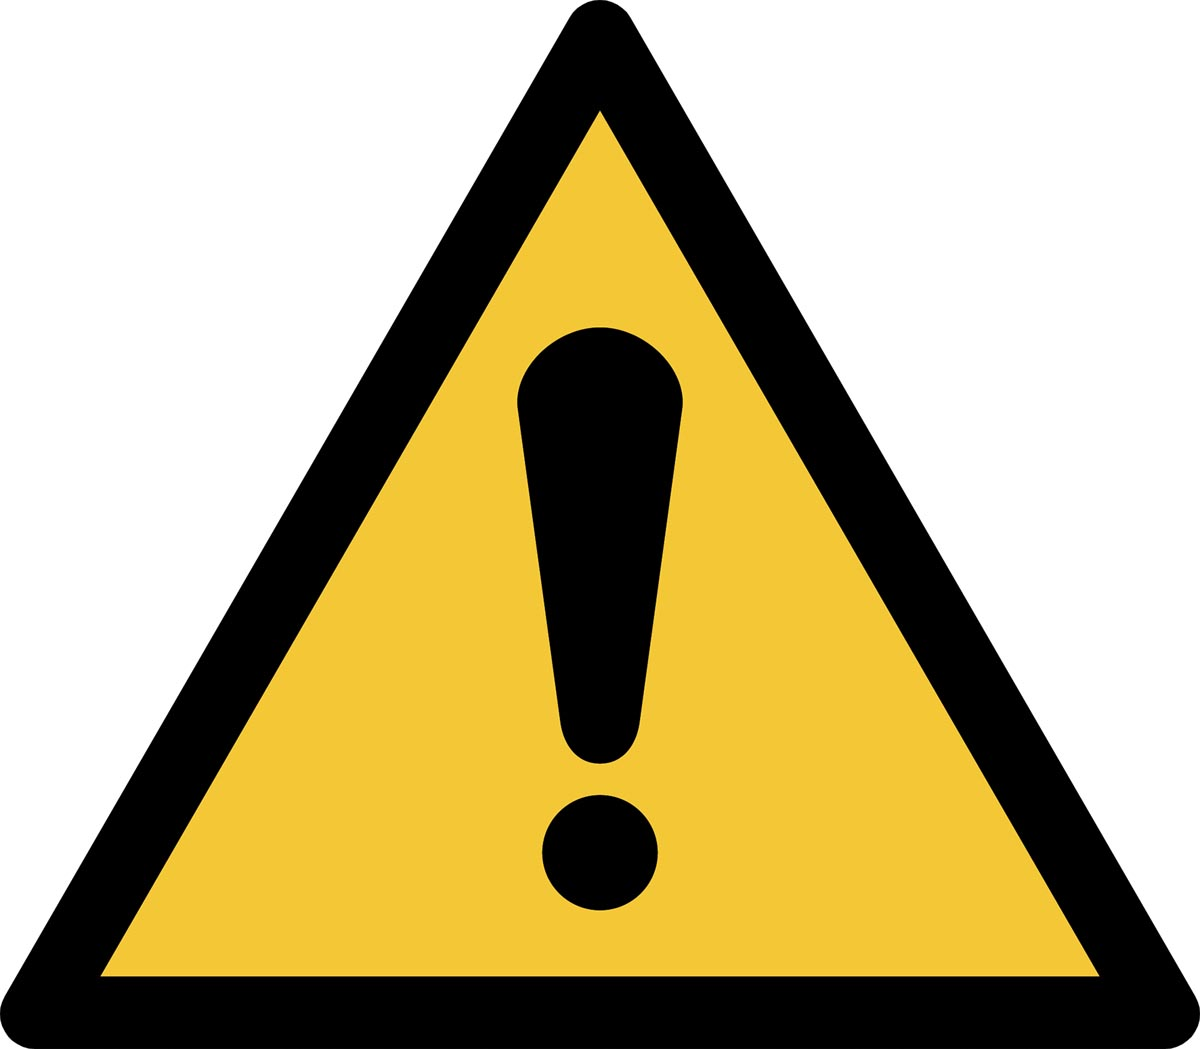 Tarifold waarschuwingsbord uit PP, algemene waarschuwing, ft 20 x 17,6 cm